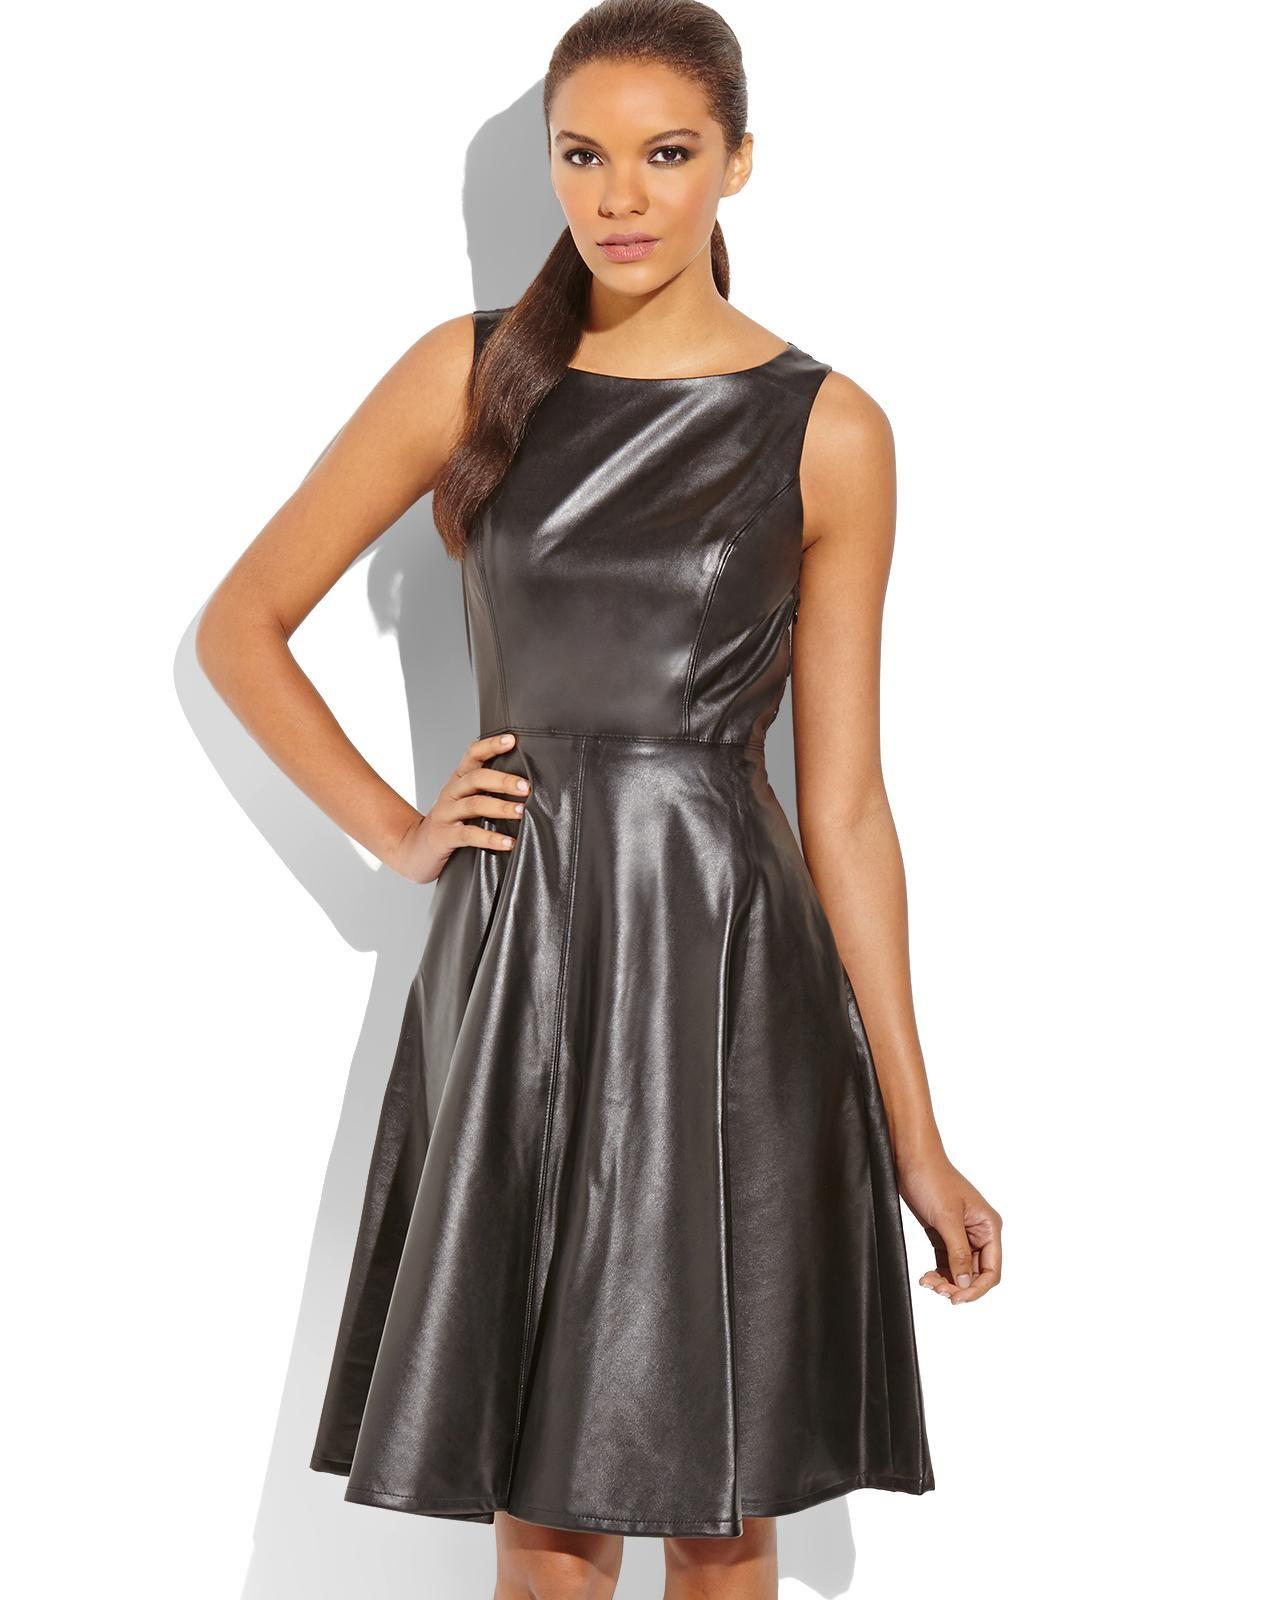 ISAAC MIZRAHI Black Faux Leather Dress discoglam dresses